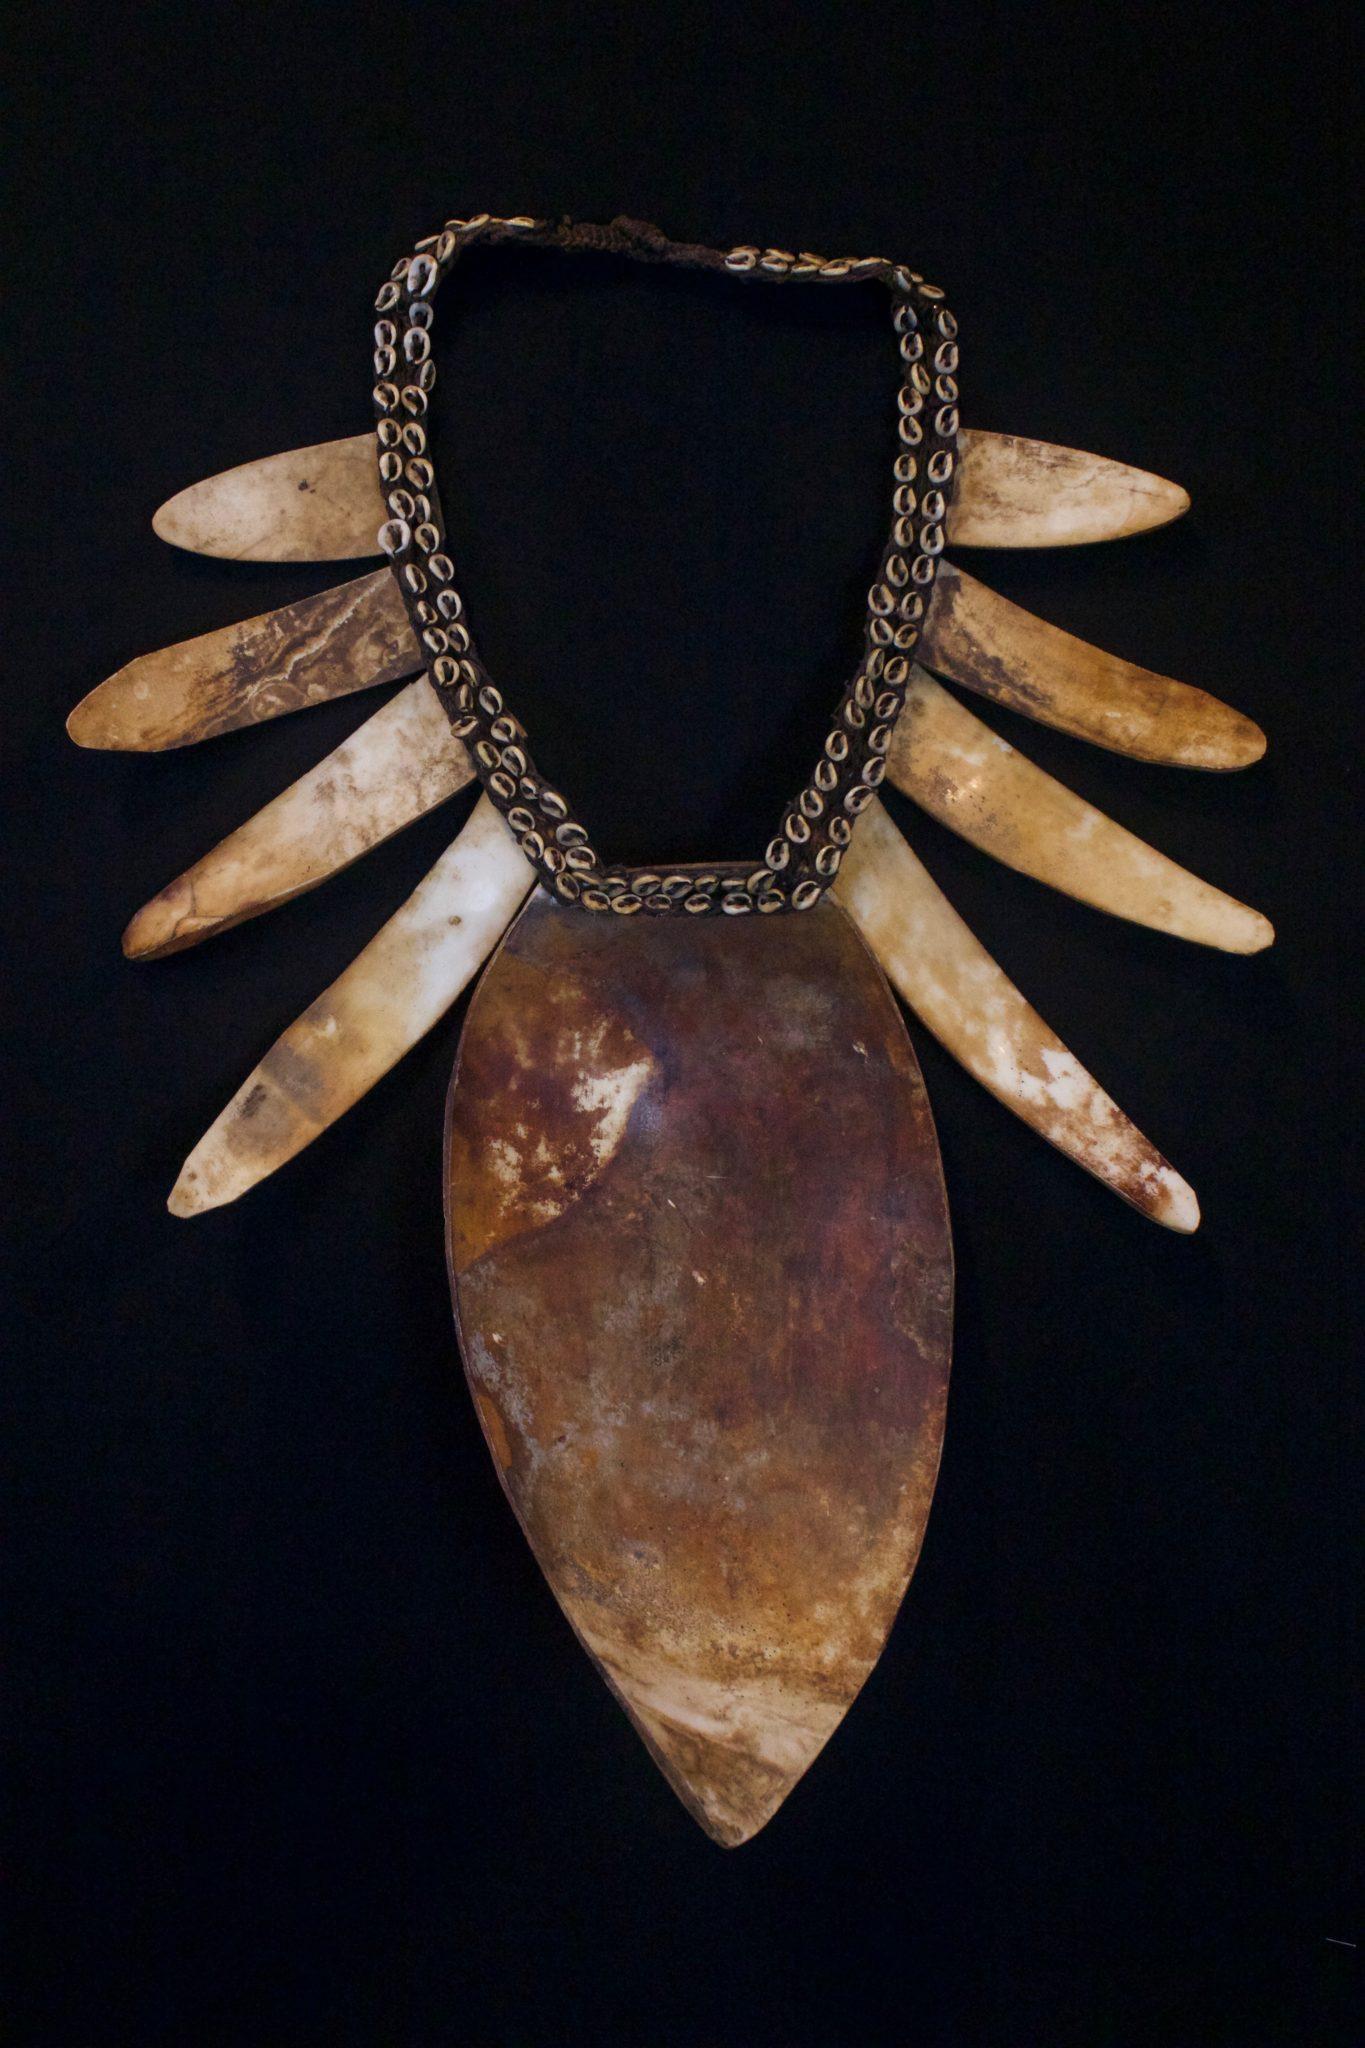 "Shaman Shell Necklace, Papua New Guinea (Irian Jaya), Indonesia, Mid 20th c. Shell, cloth, fiber cord. Worn by the shaman for healing ceremonies. 19"" x 15"" x 3 ½"" $850."